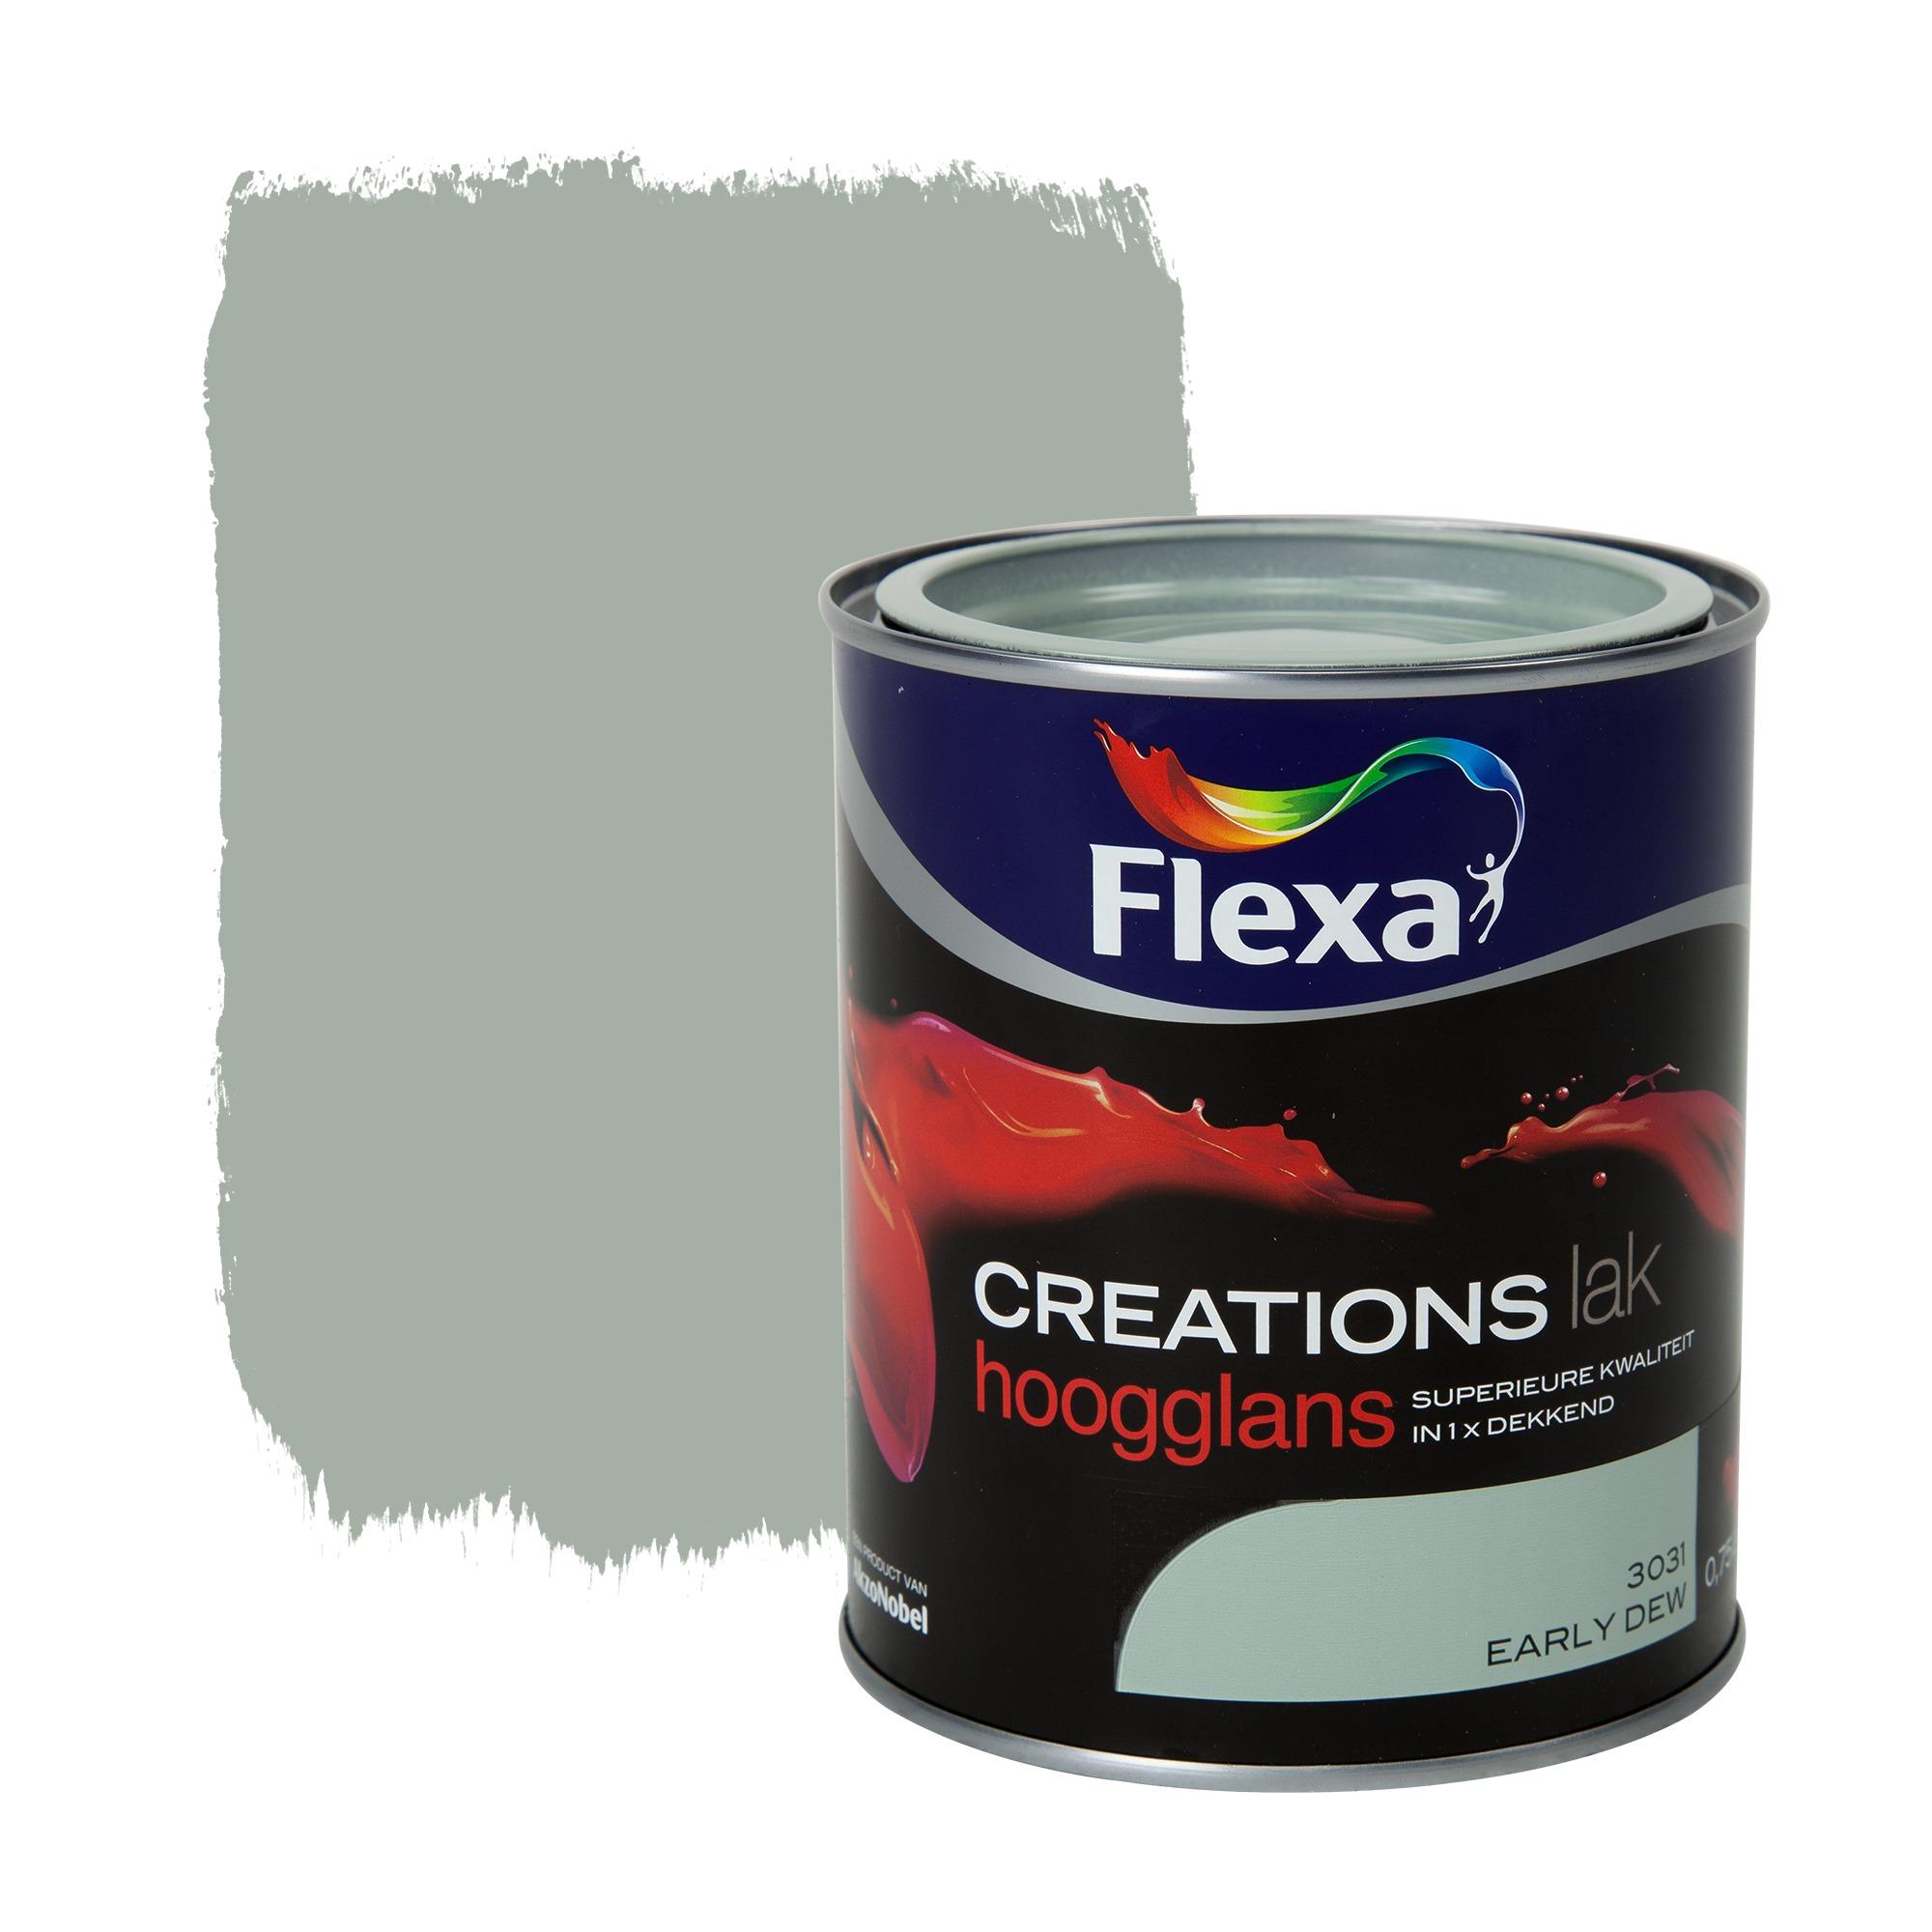 early dew flexa creations verf